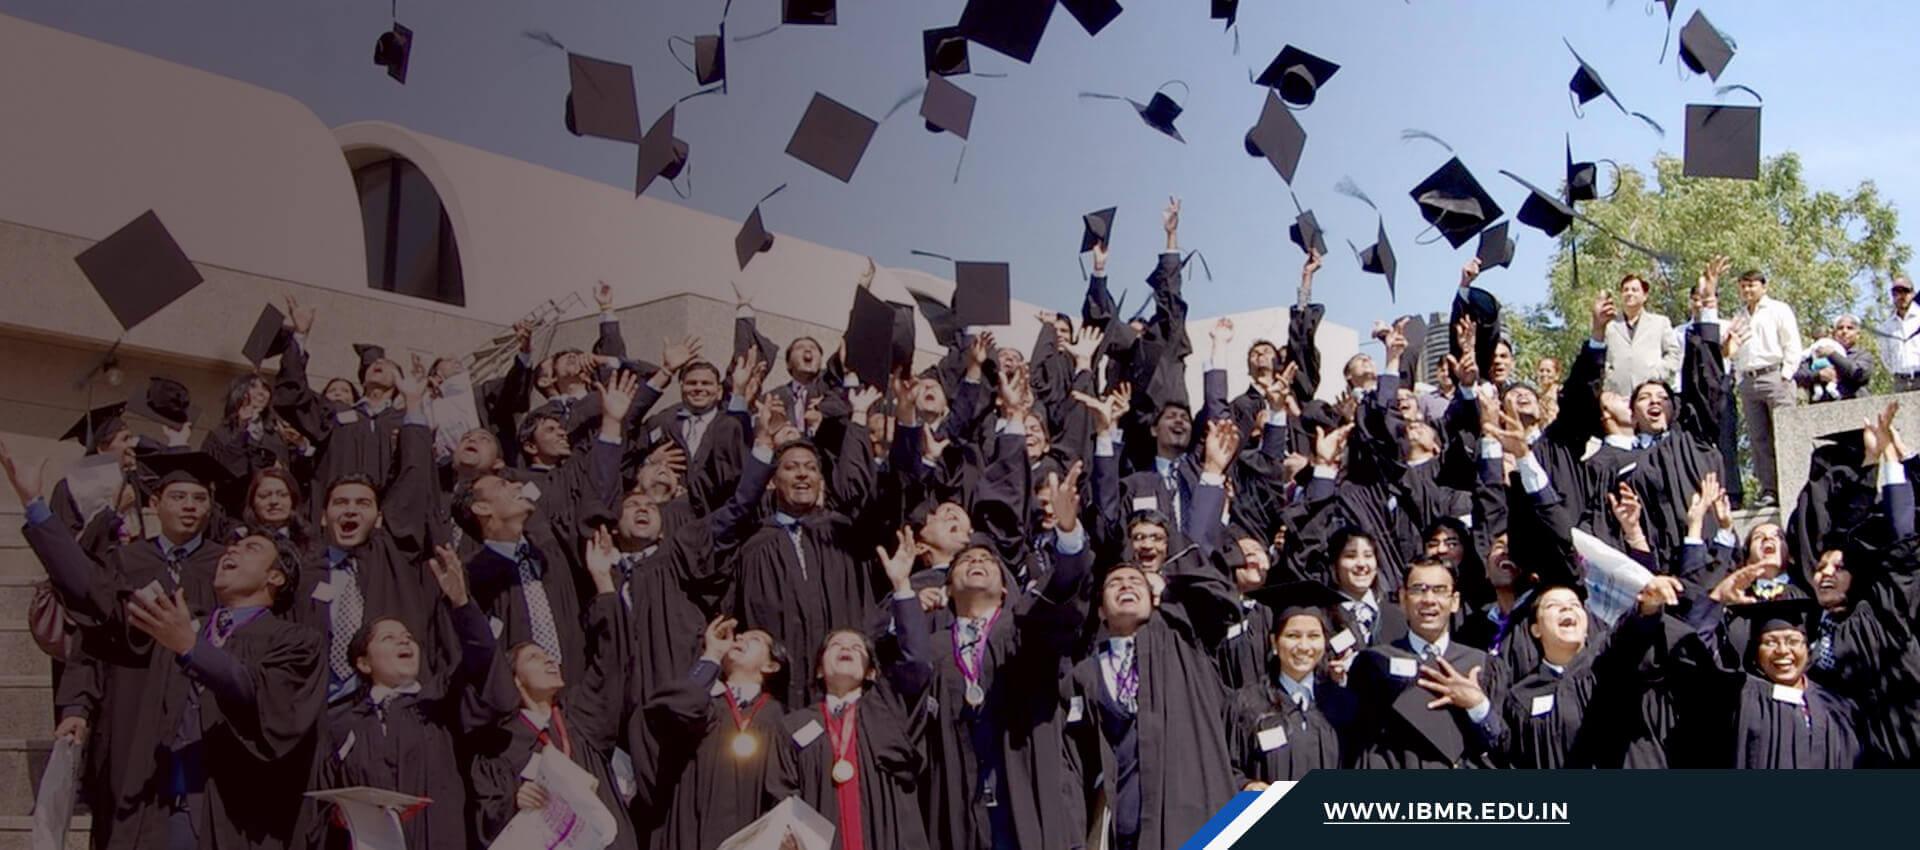 IBMR - MBA School - 8000+ Alumni